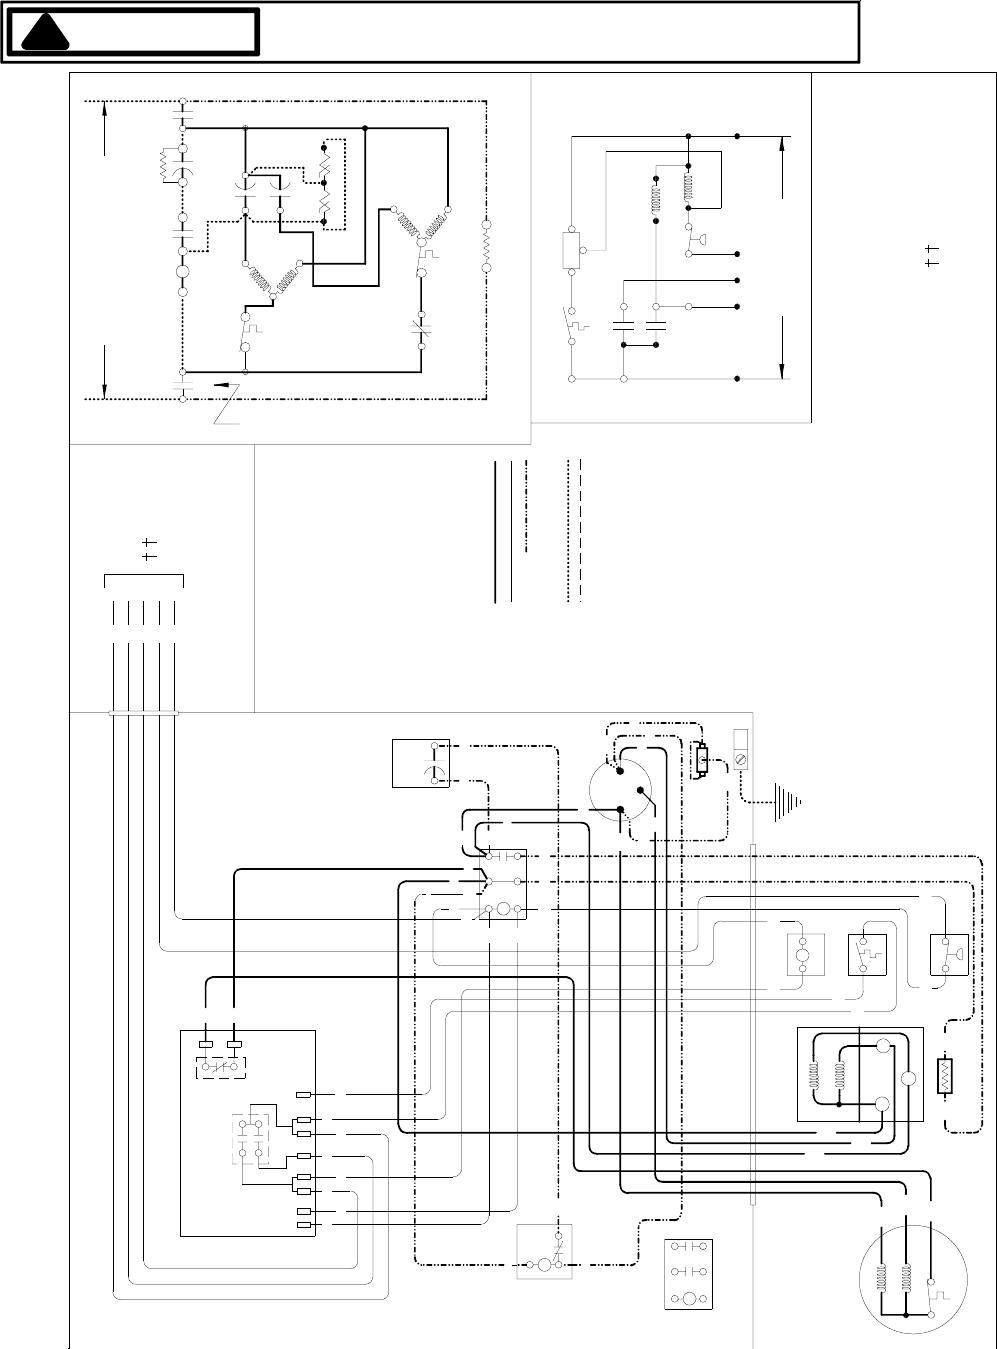 Goodman Mfg Gsc140421a Users Manual Manufacturing Wiring Diagrams